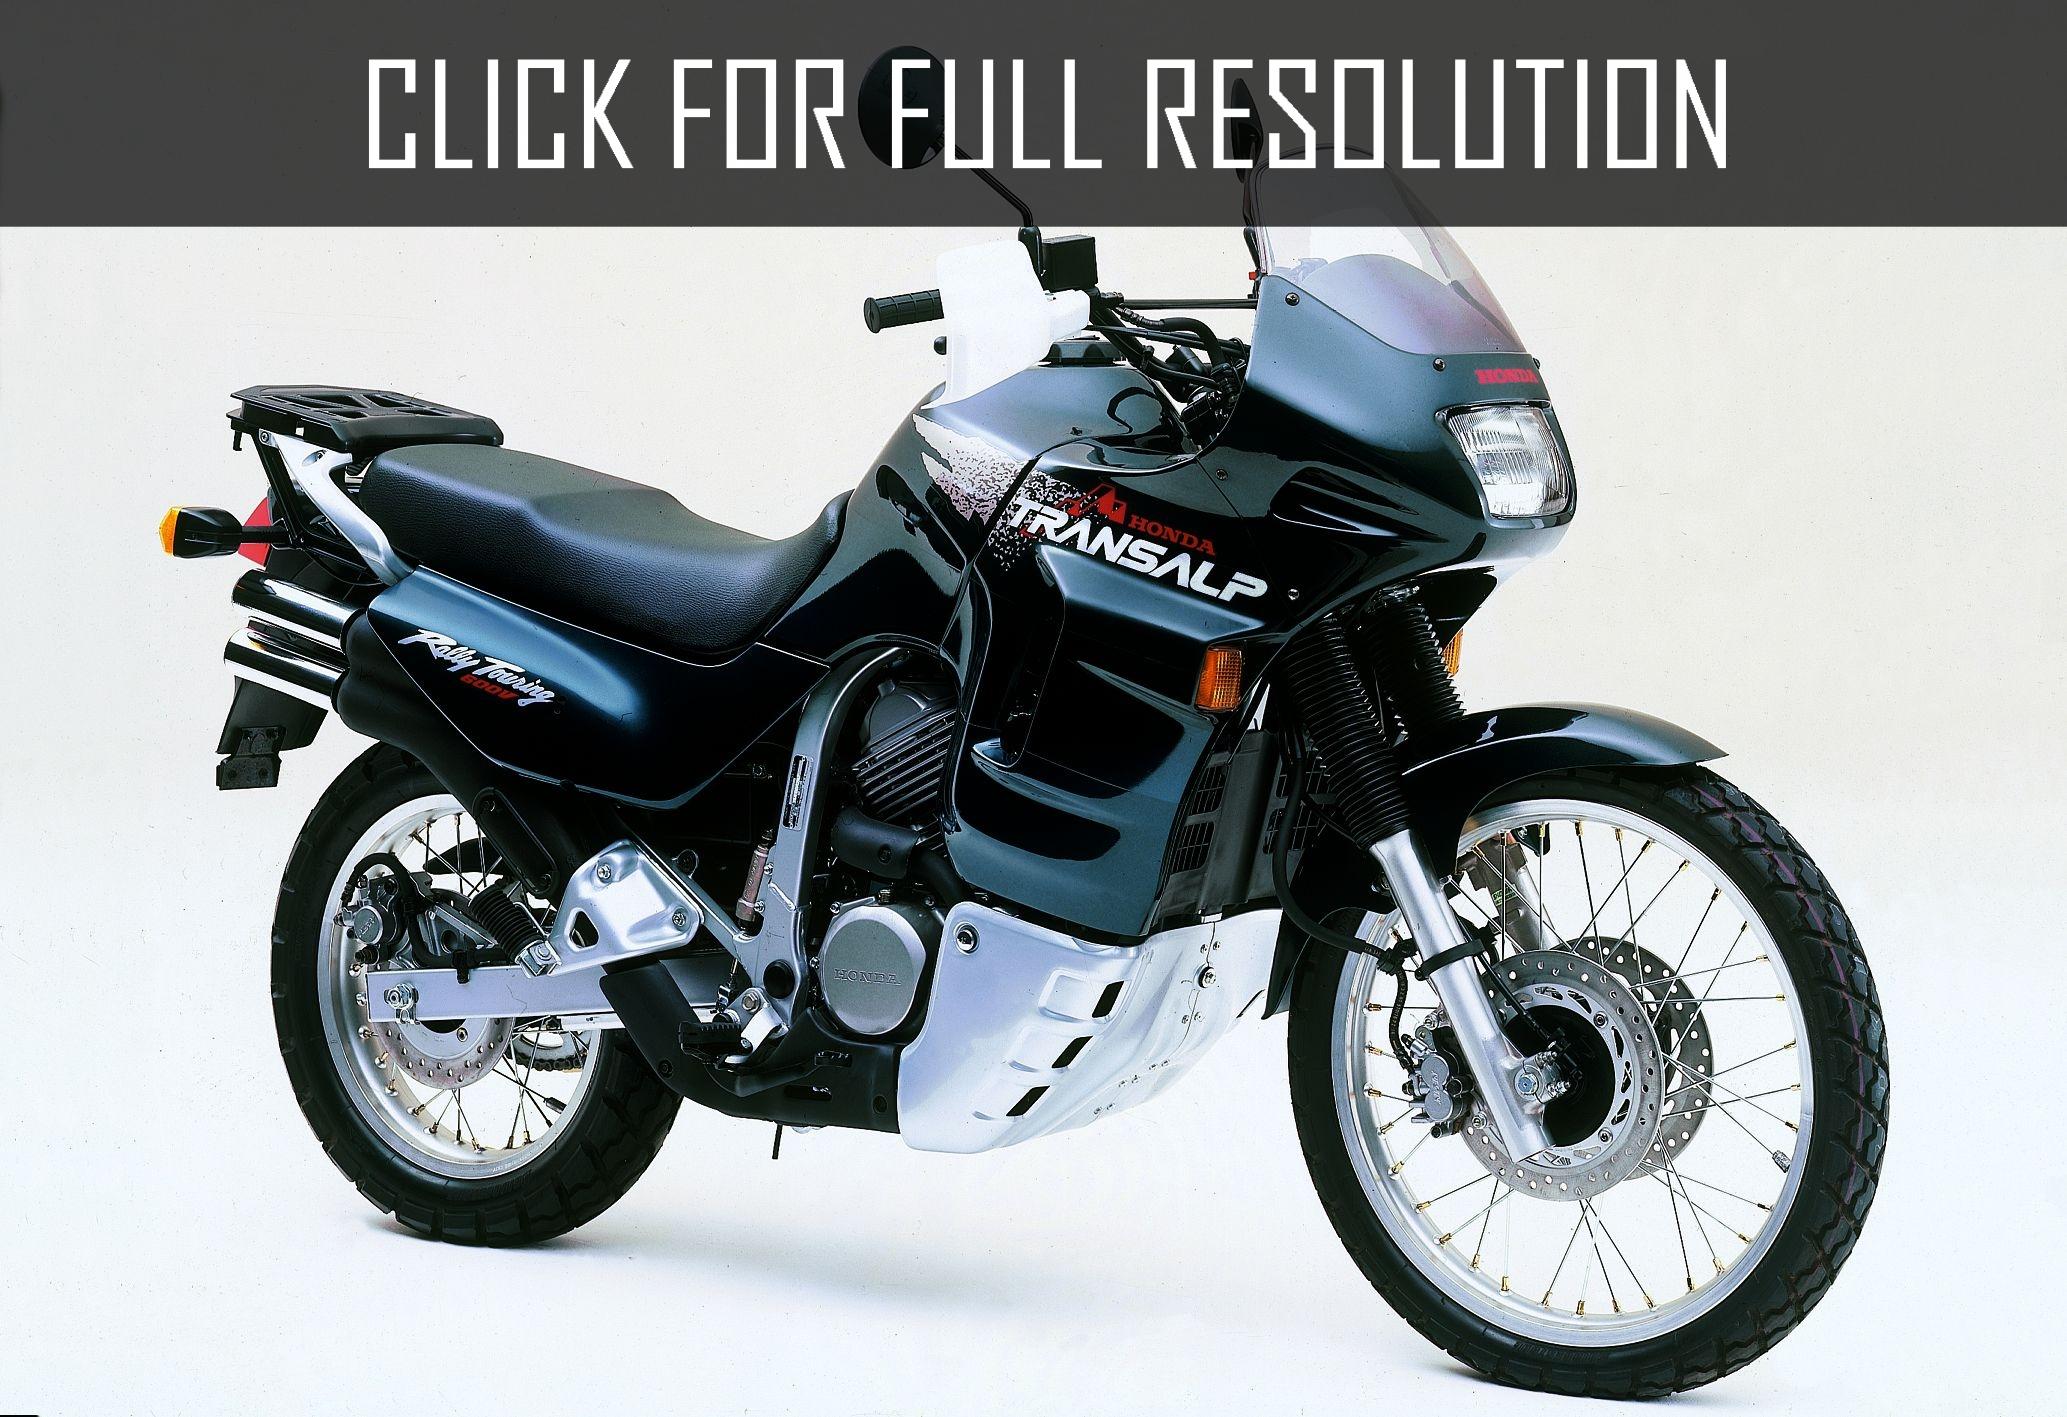 Мануалы и документация для Honda XL400V и Honda XL600V Transalp